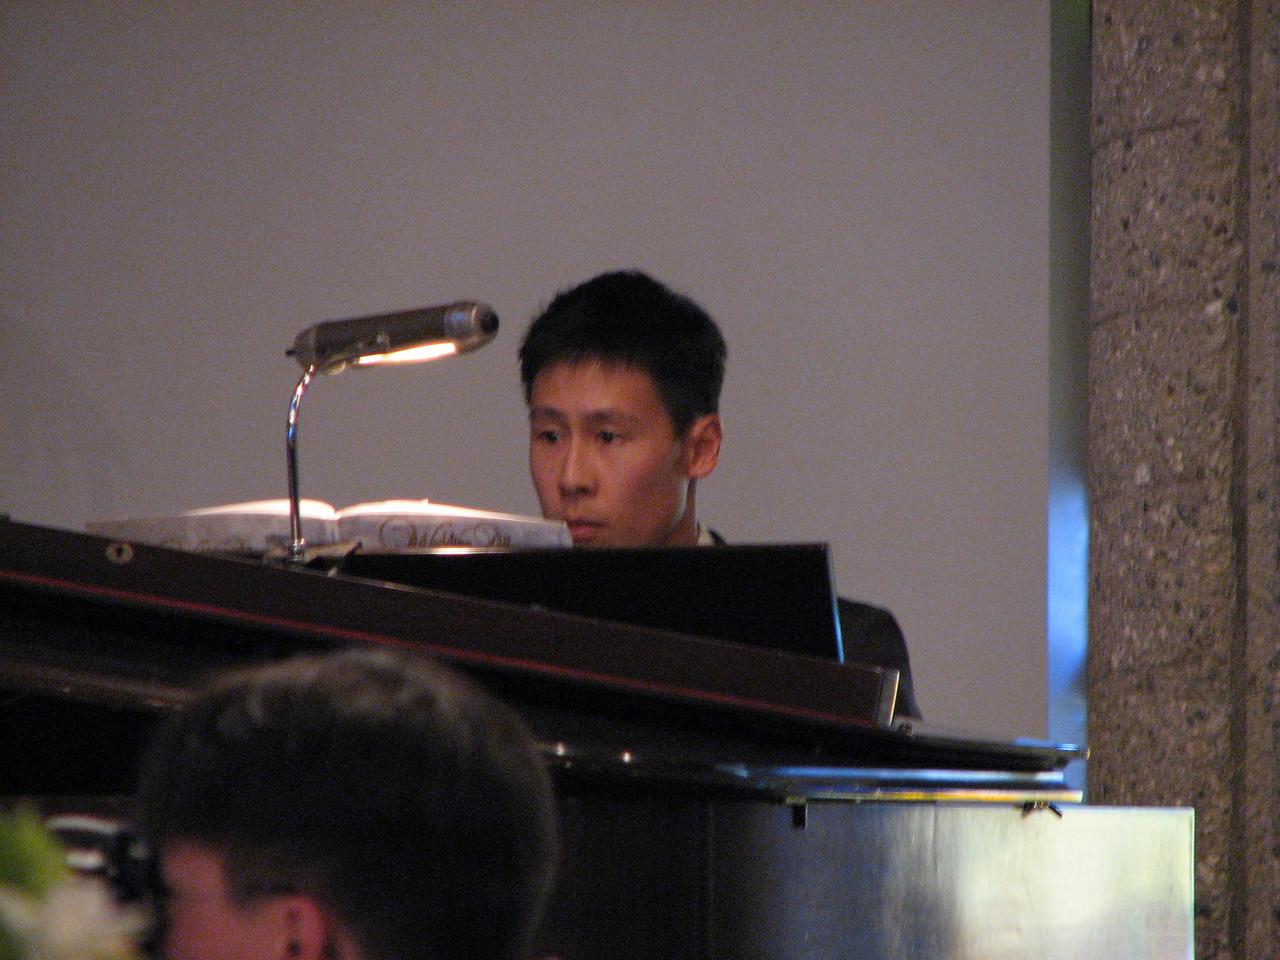 2007 06 09 Sat - Pianist - Dave Lee 1